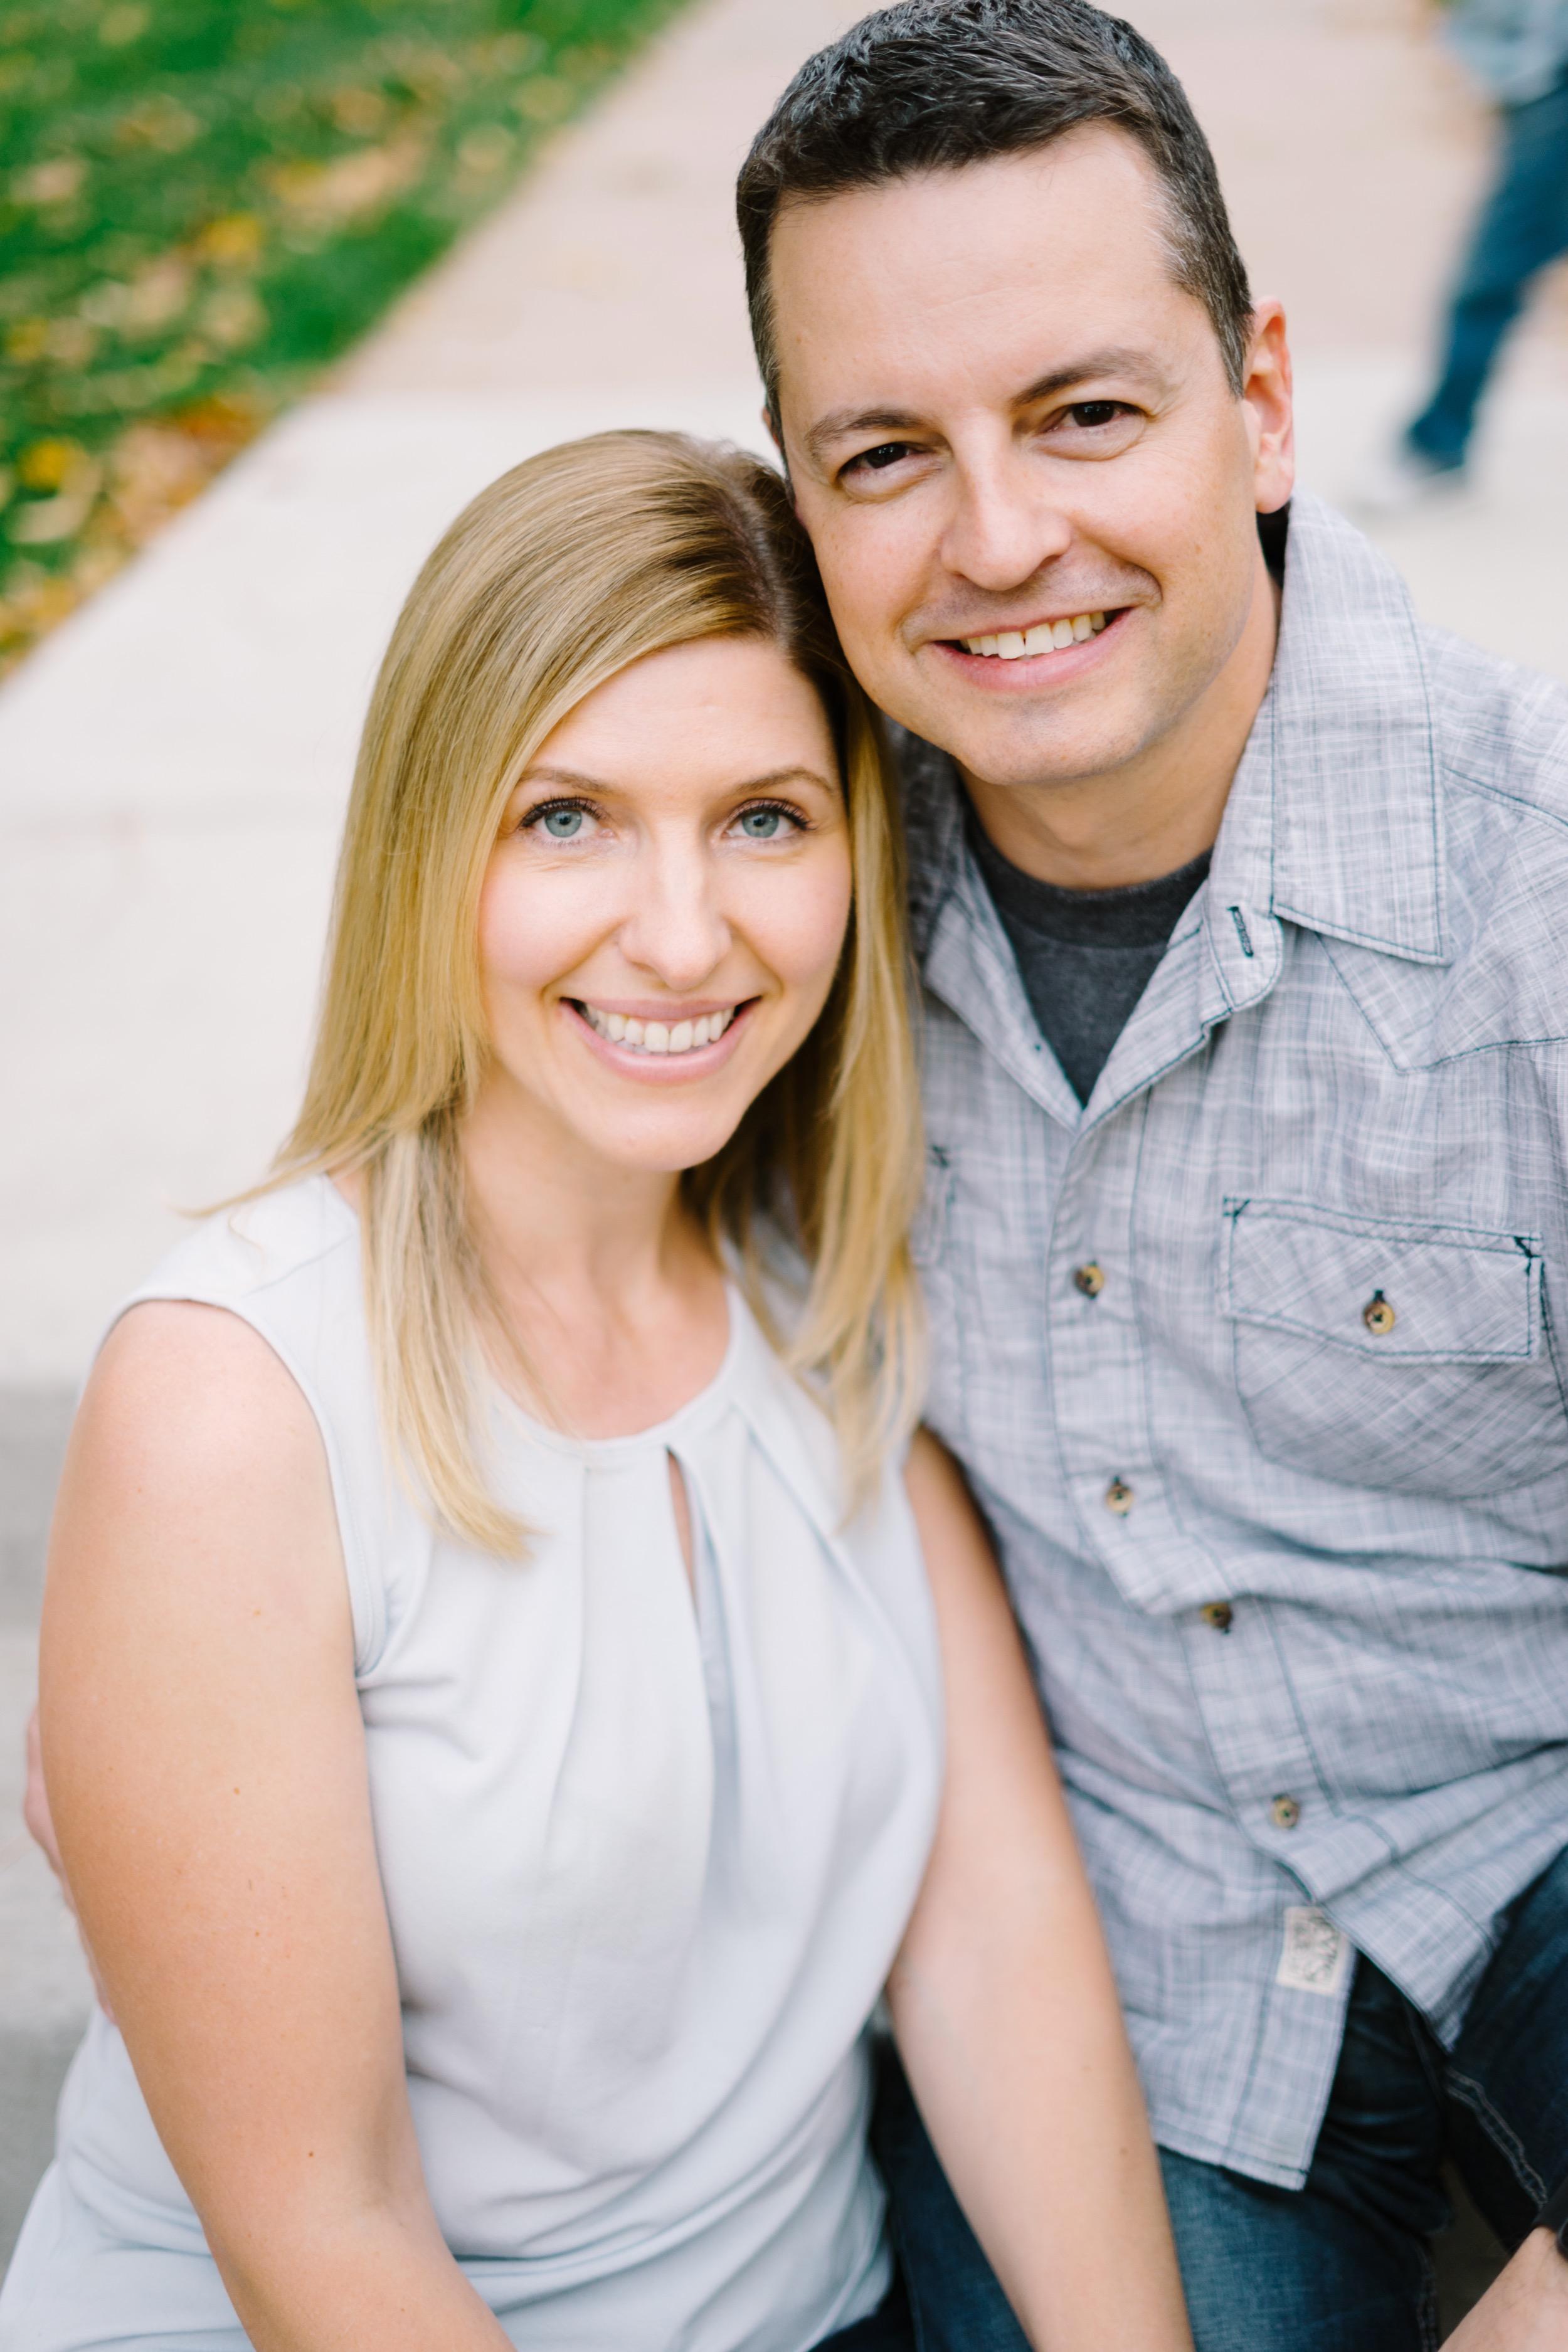 Denver Family Photography Dr. Bates - 28.jpg